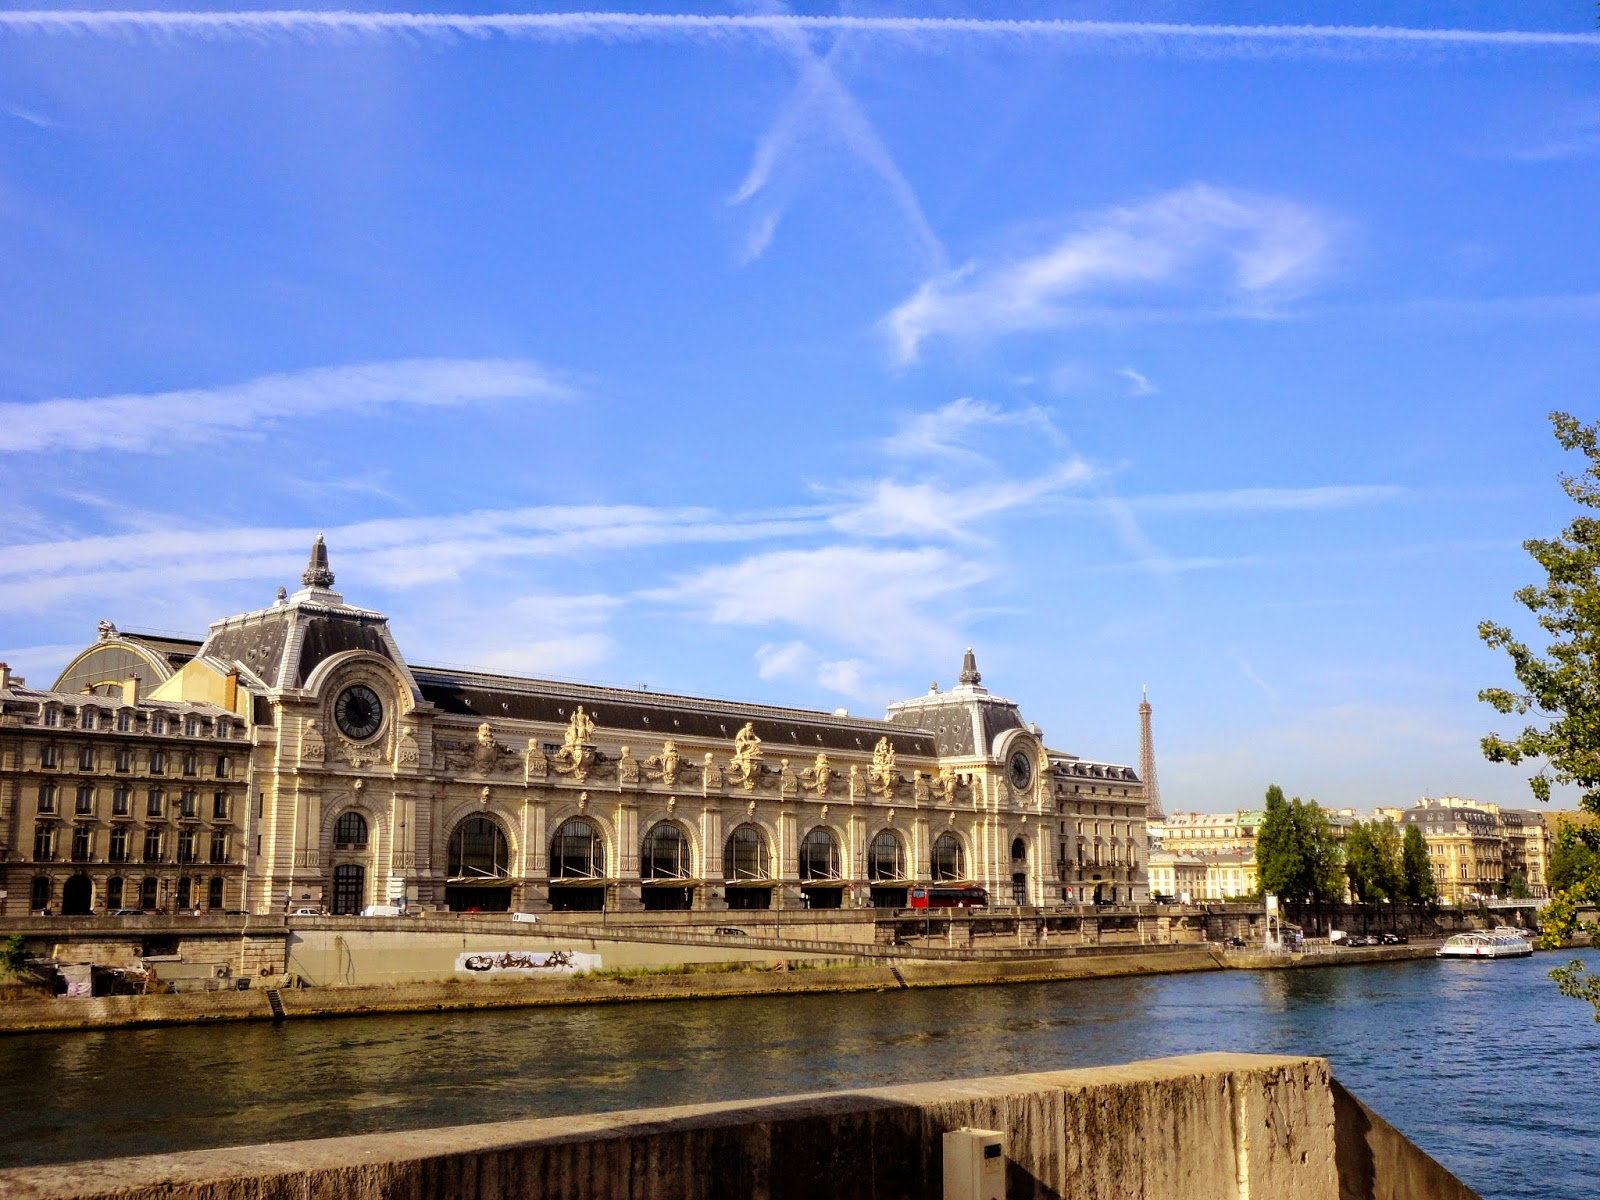 Musee d'Orsay & River Seine, Paris